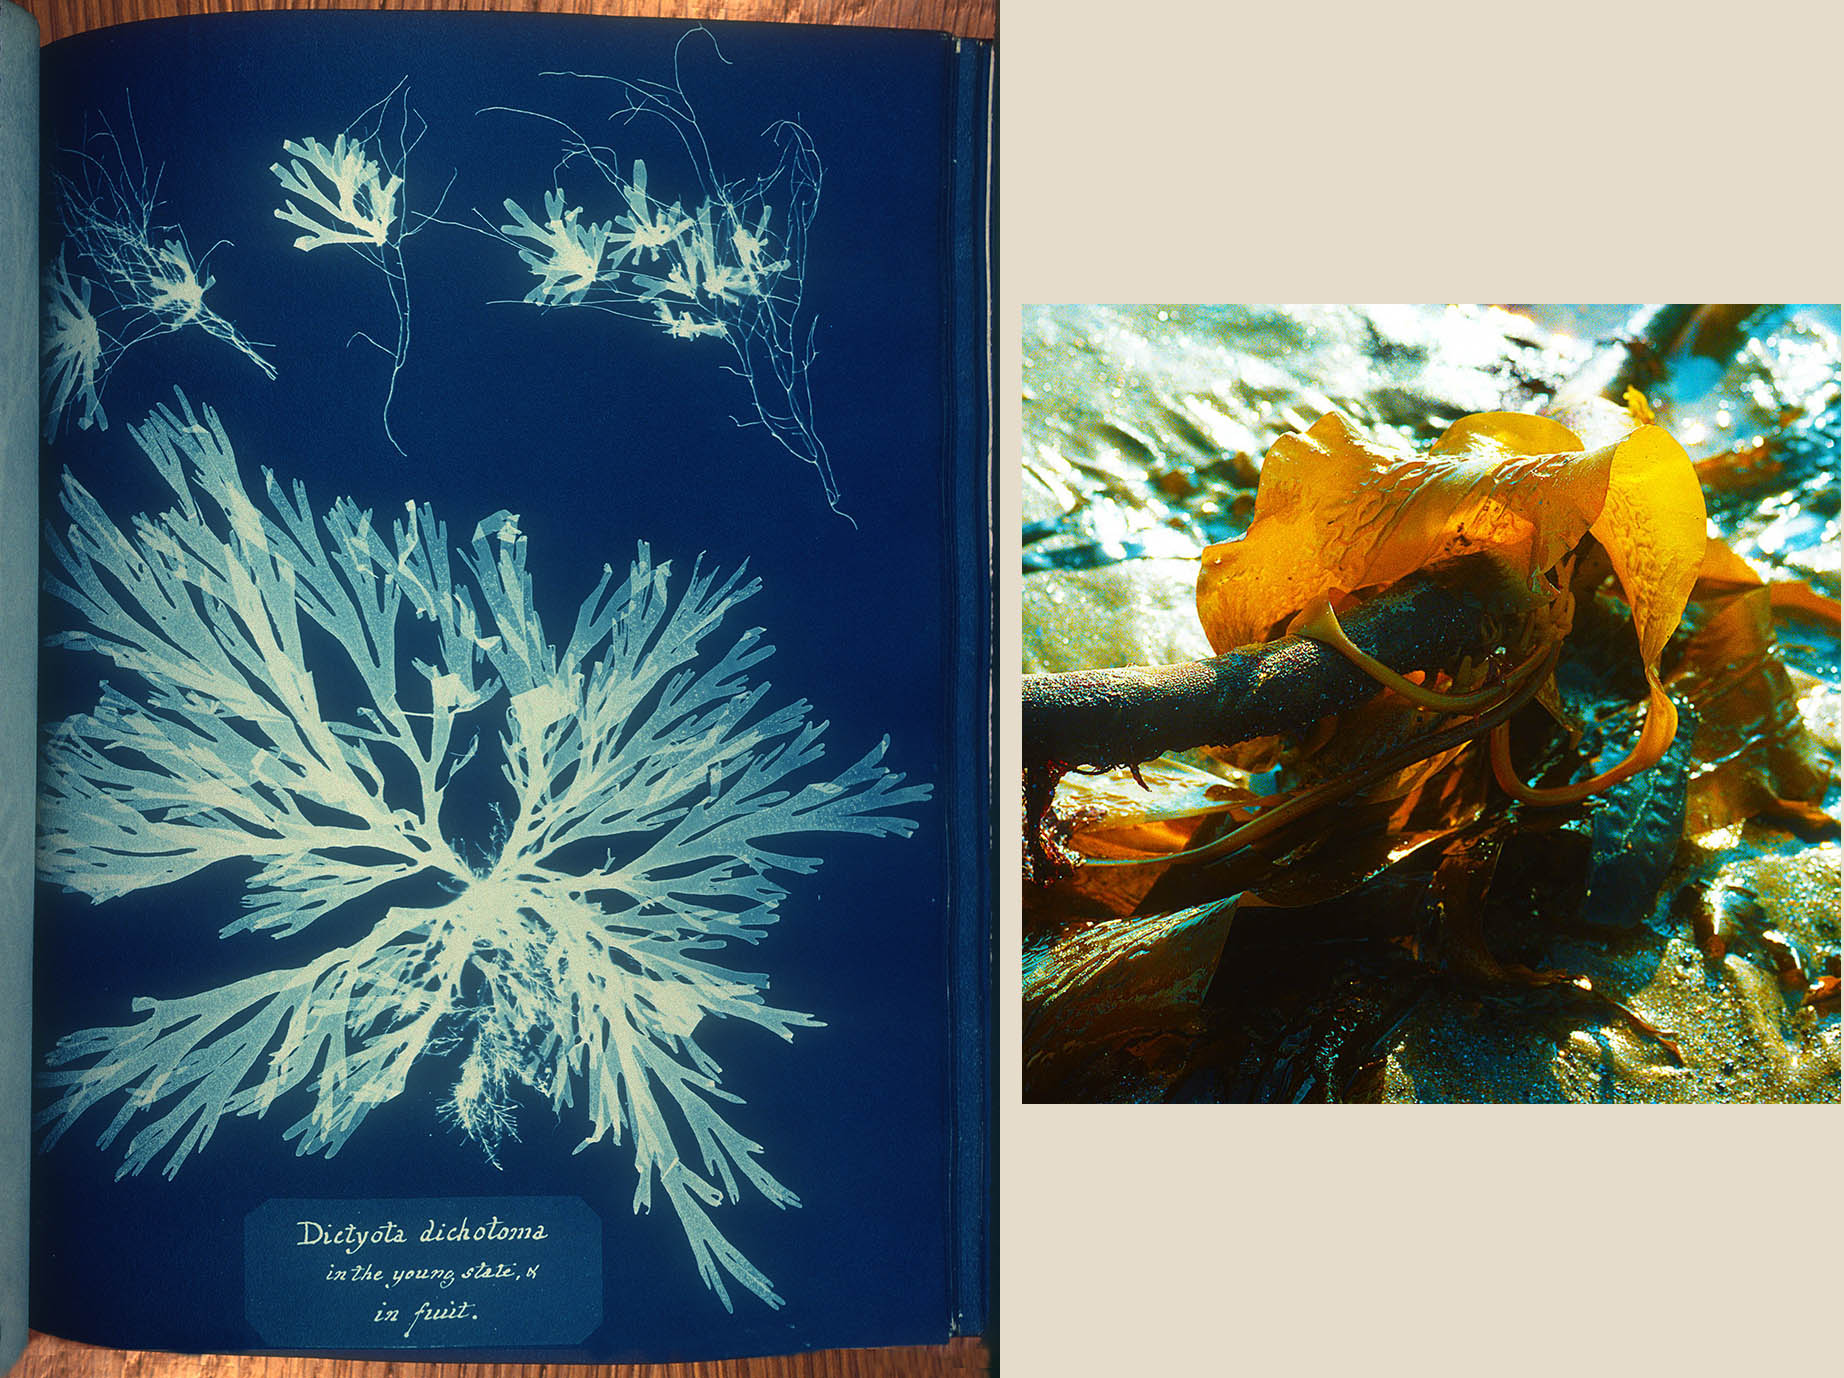 DictyotaDichotoma-LinnSoc_backlit-algae